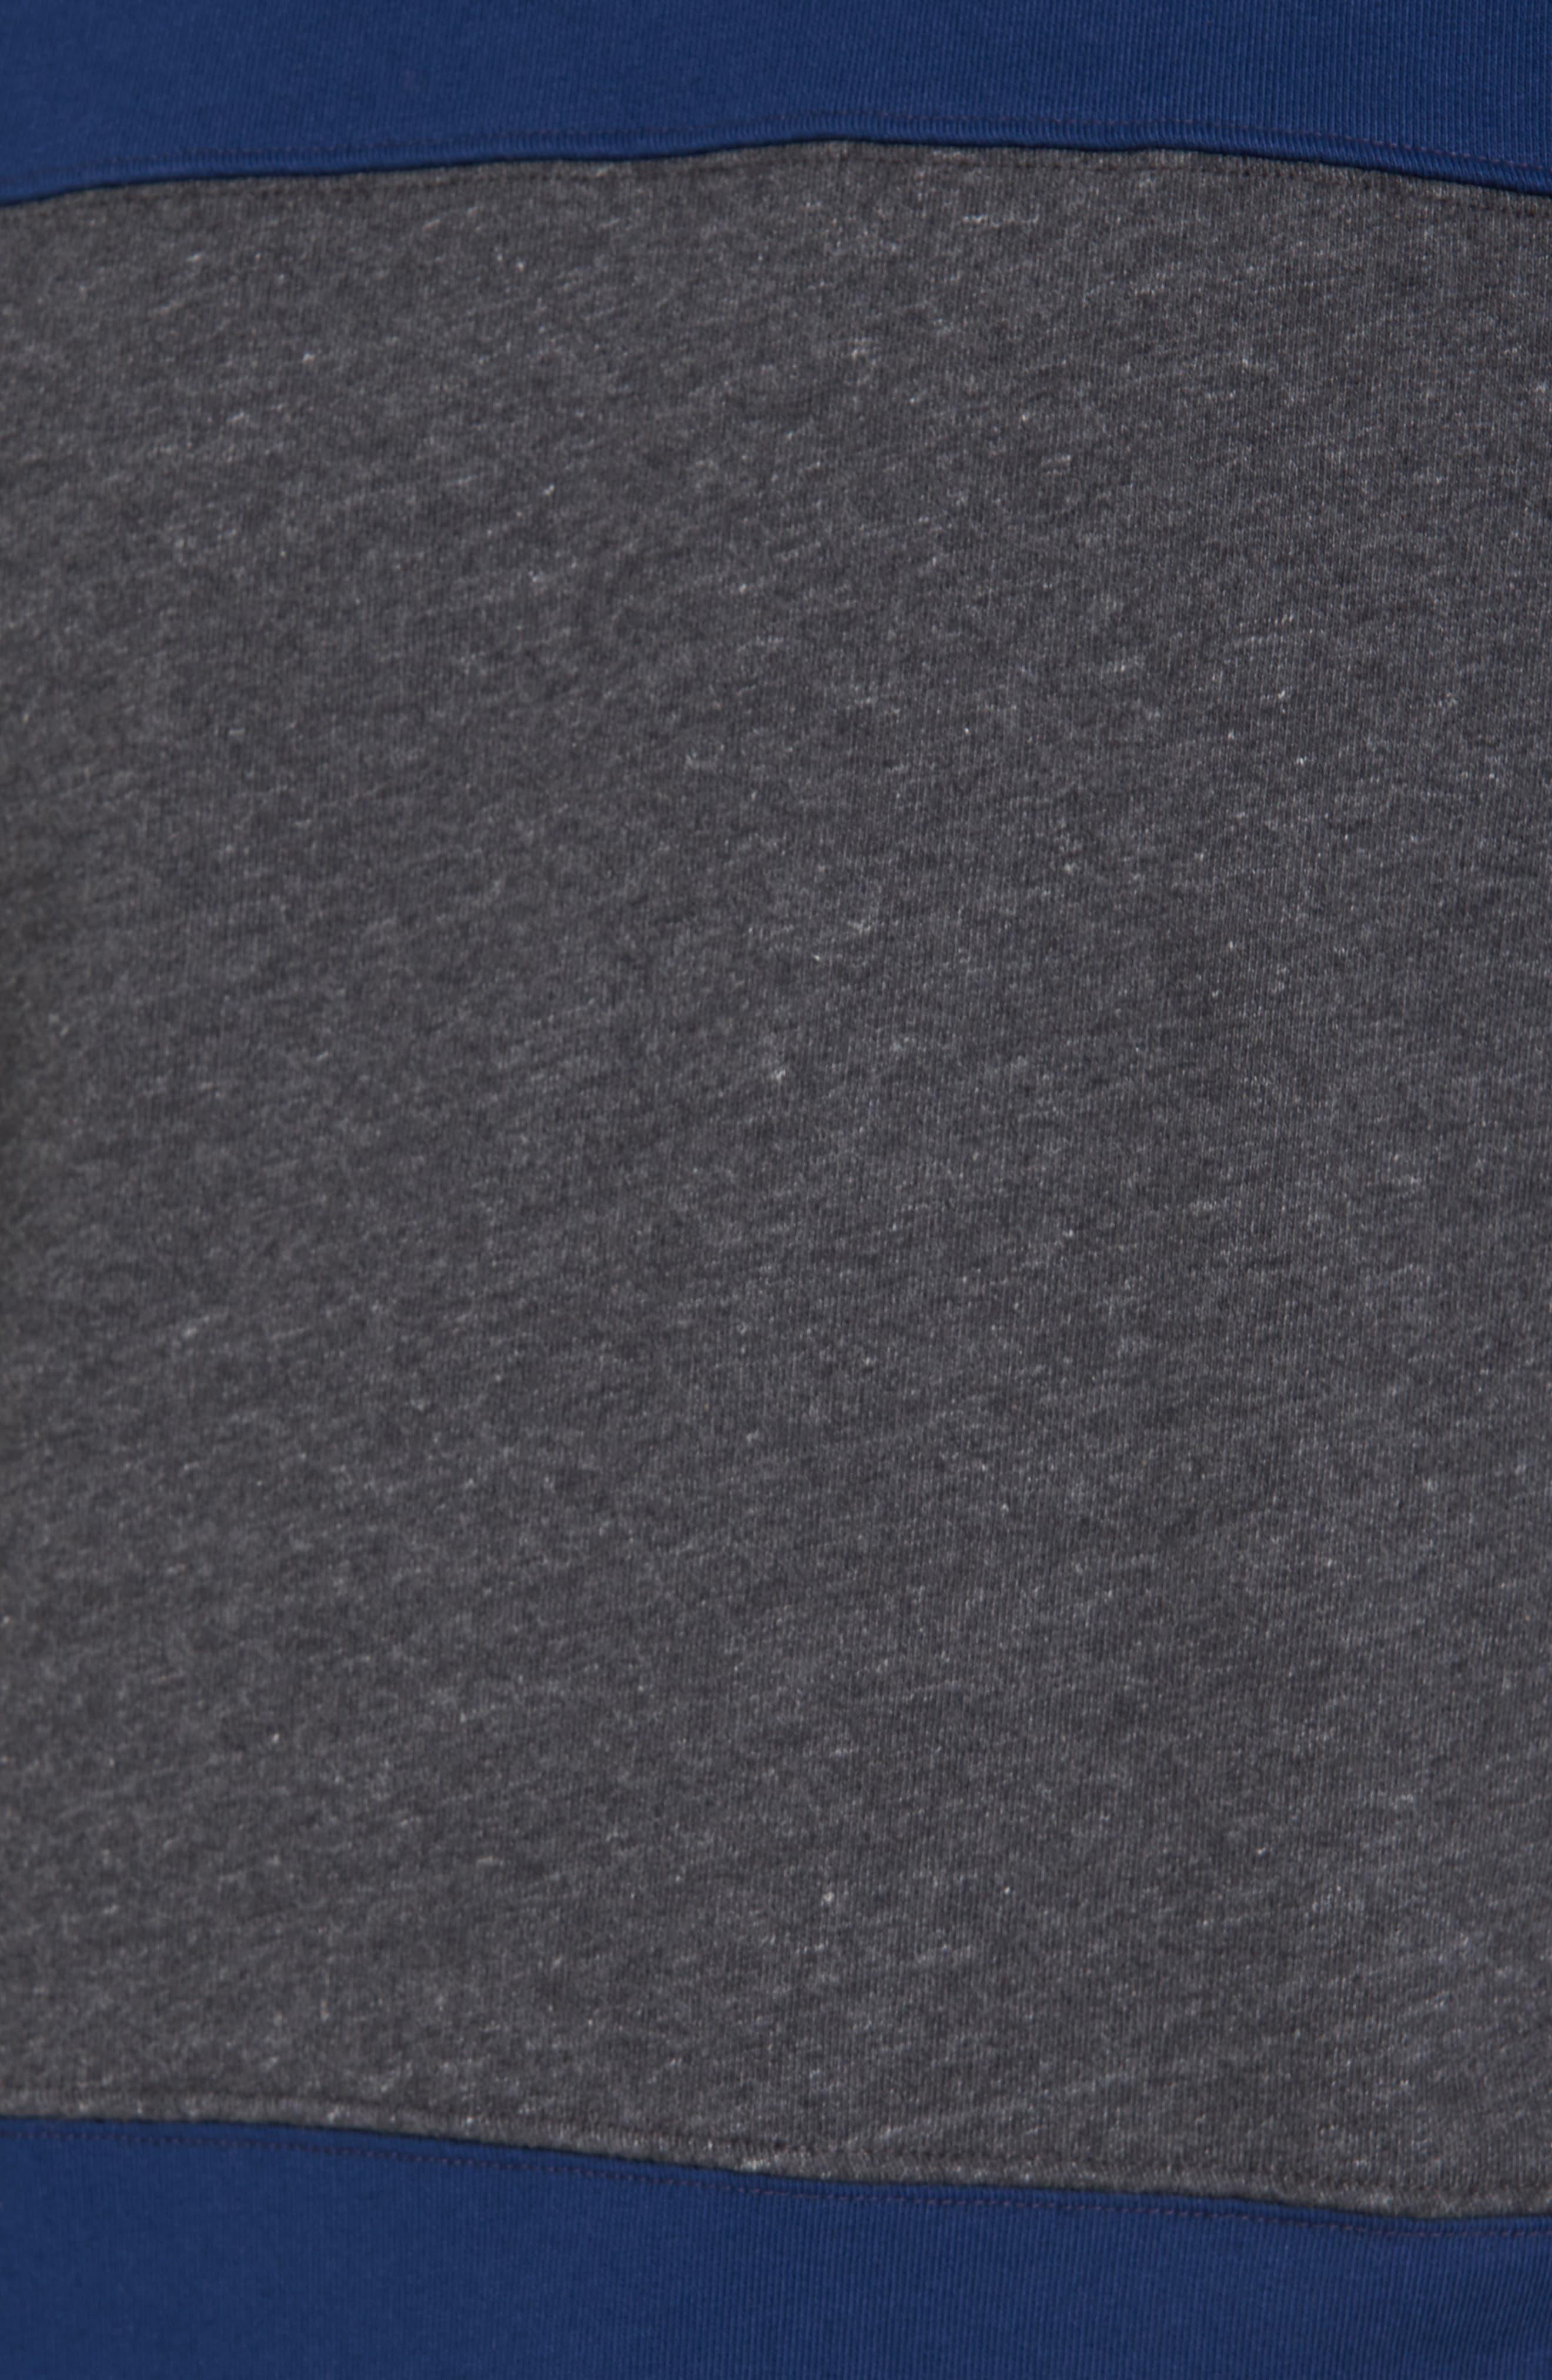 Tipped Colorblock Sweatshirt,                             Alternate thumbnail 2, color,                             Night Rider